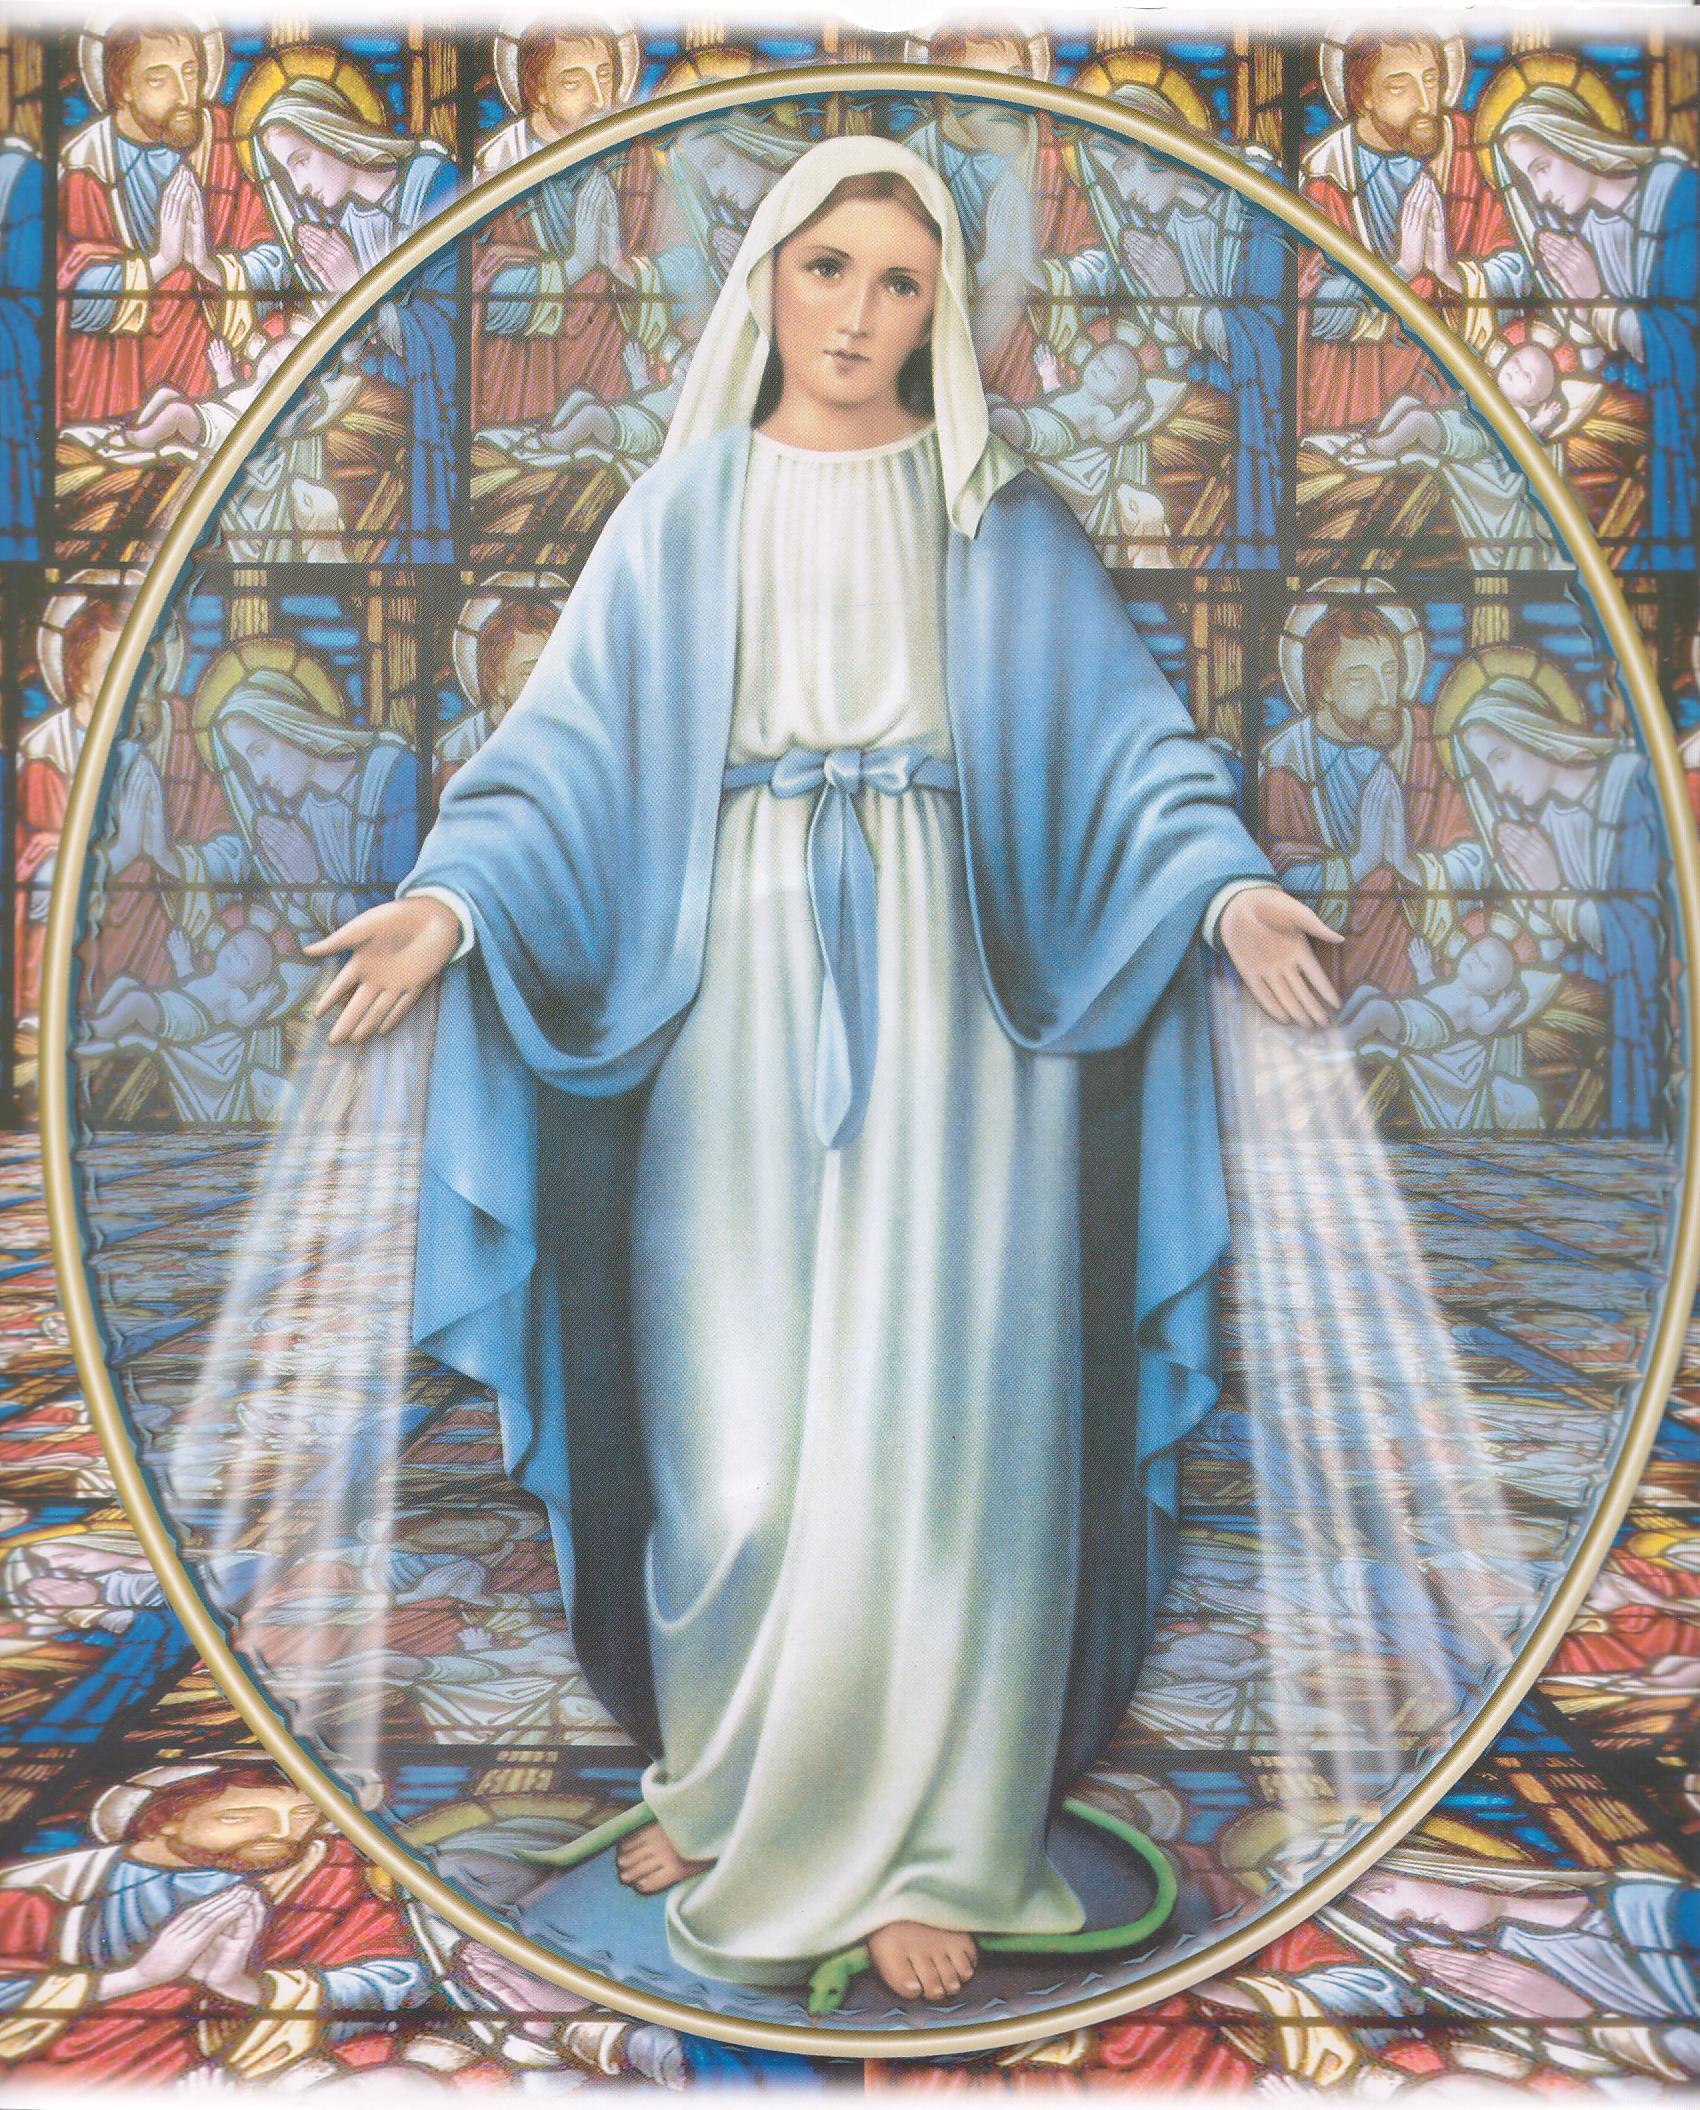 virgin mary com www